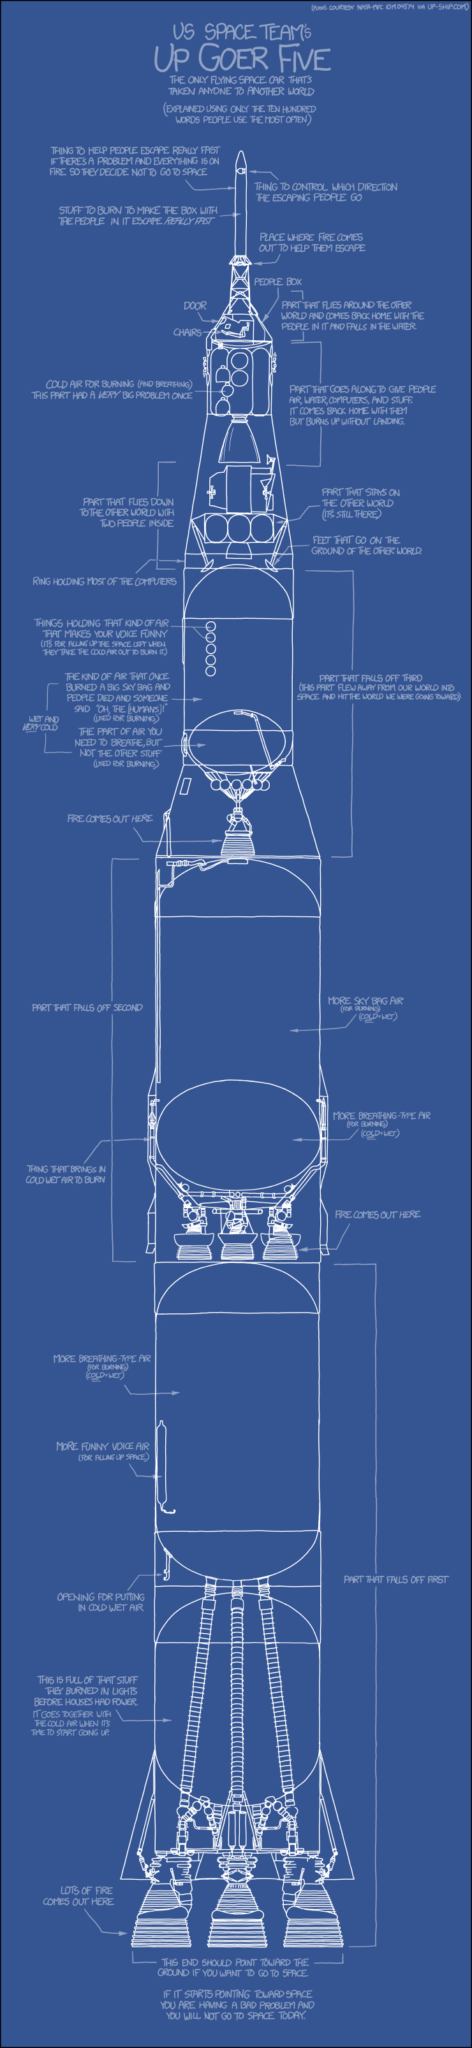 150530 XKCD up_goer_five diagram